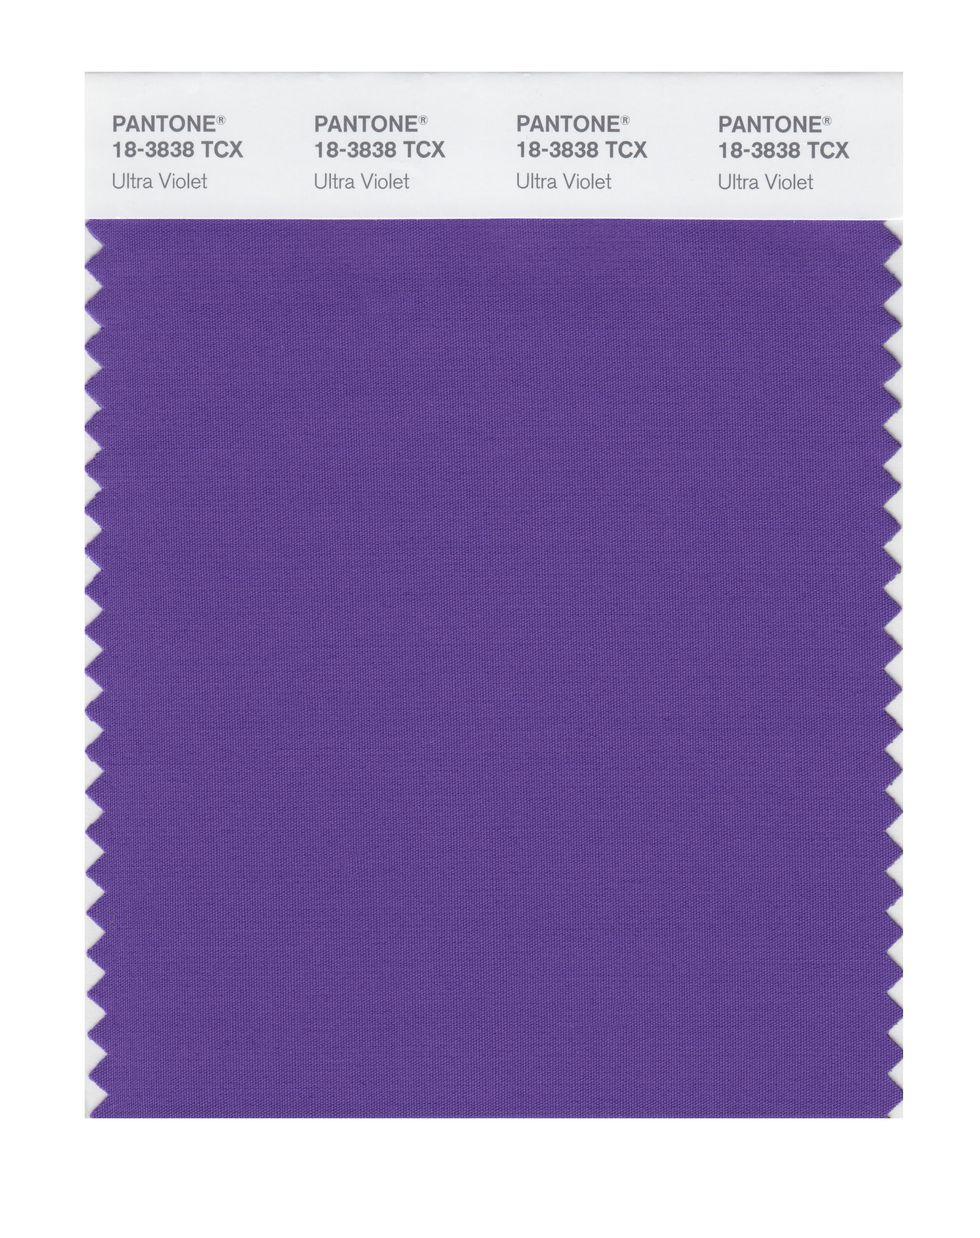 ultra violet.jpg